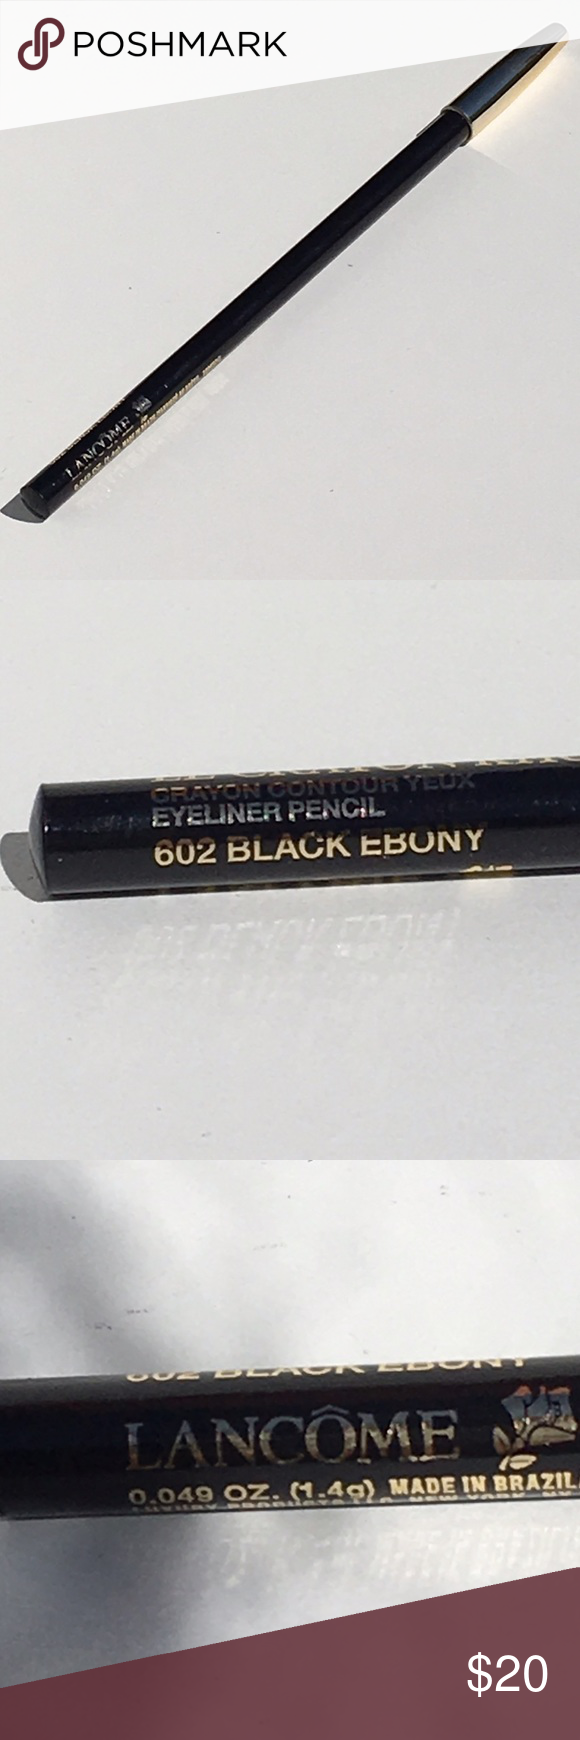 NWT! Lancôme Le Kohl 602 Black Ebony Eye Pencil Boutique